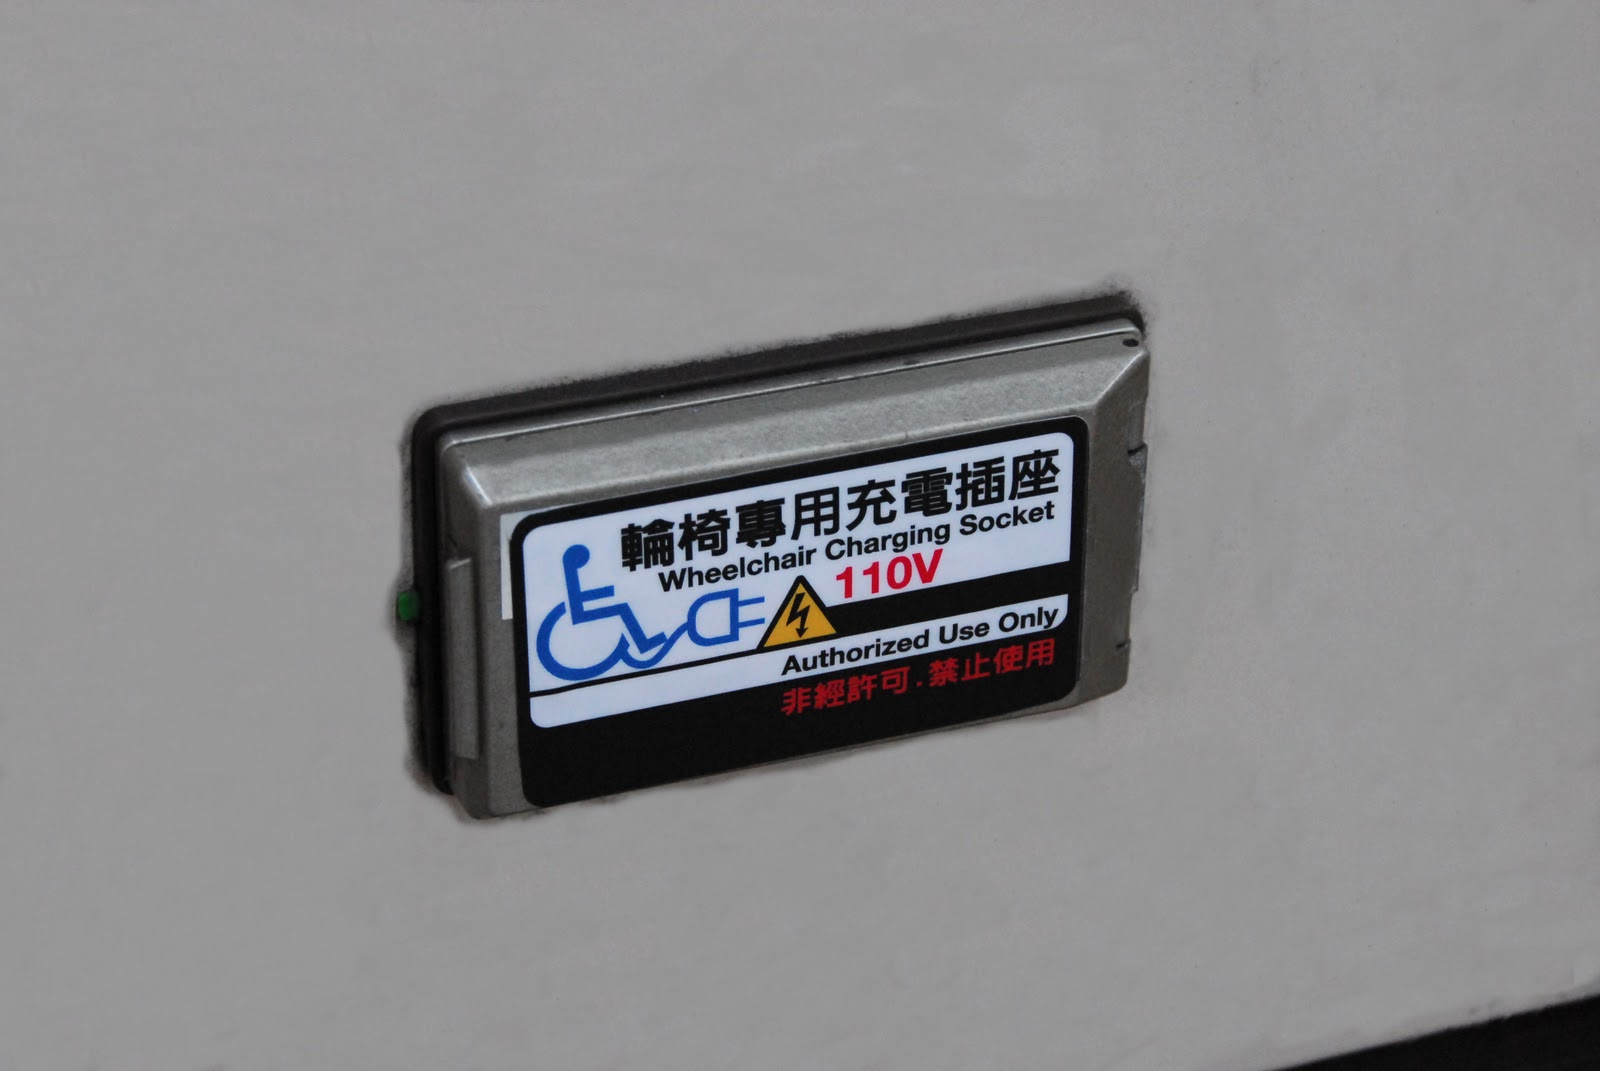 Fun Taipei Life Information-Fun臺北 生活情報誌-pdn: 臺北捷運提供電動輪椅旅客續航動力 各場站計117處專用充電設施 ...